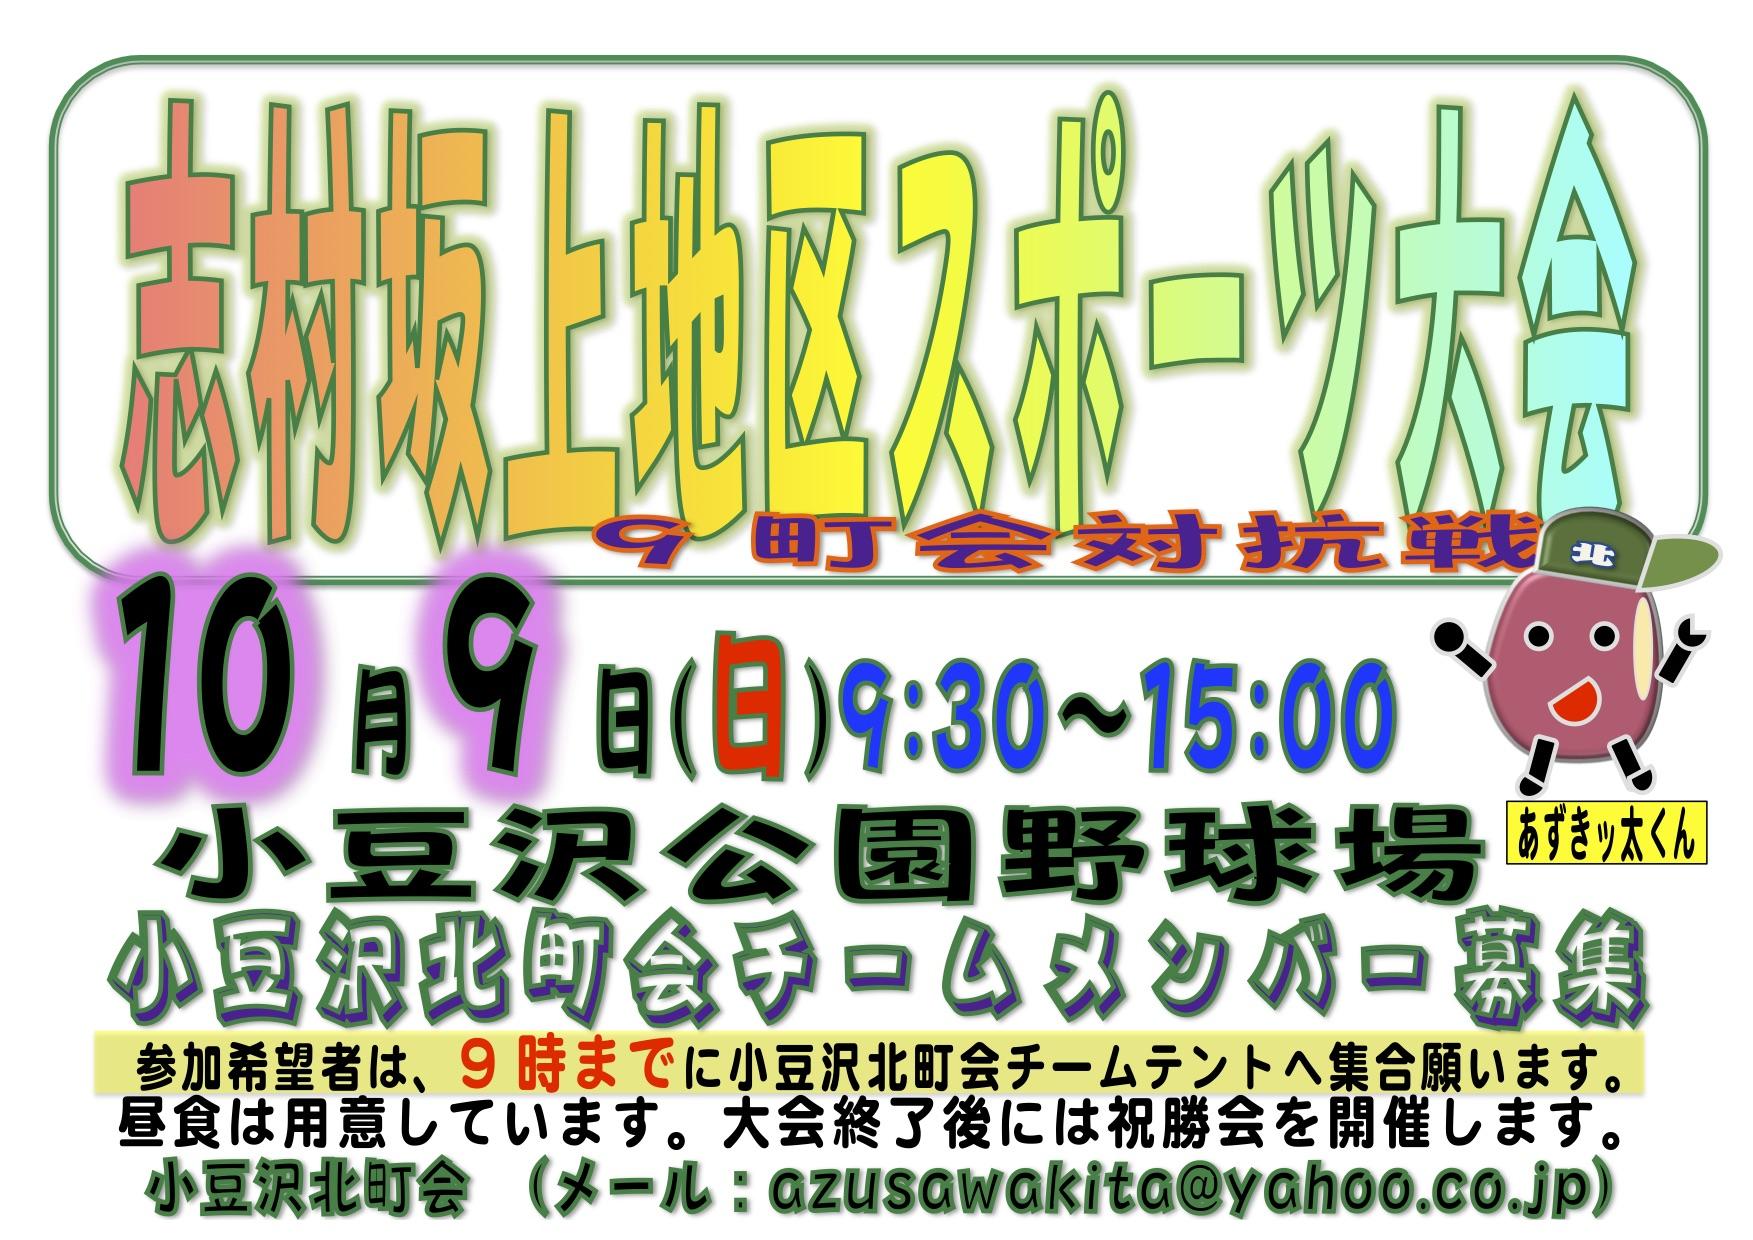 2016年10月9日(日)志村坂上地区スポーツ大会